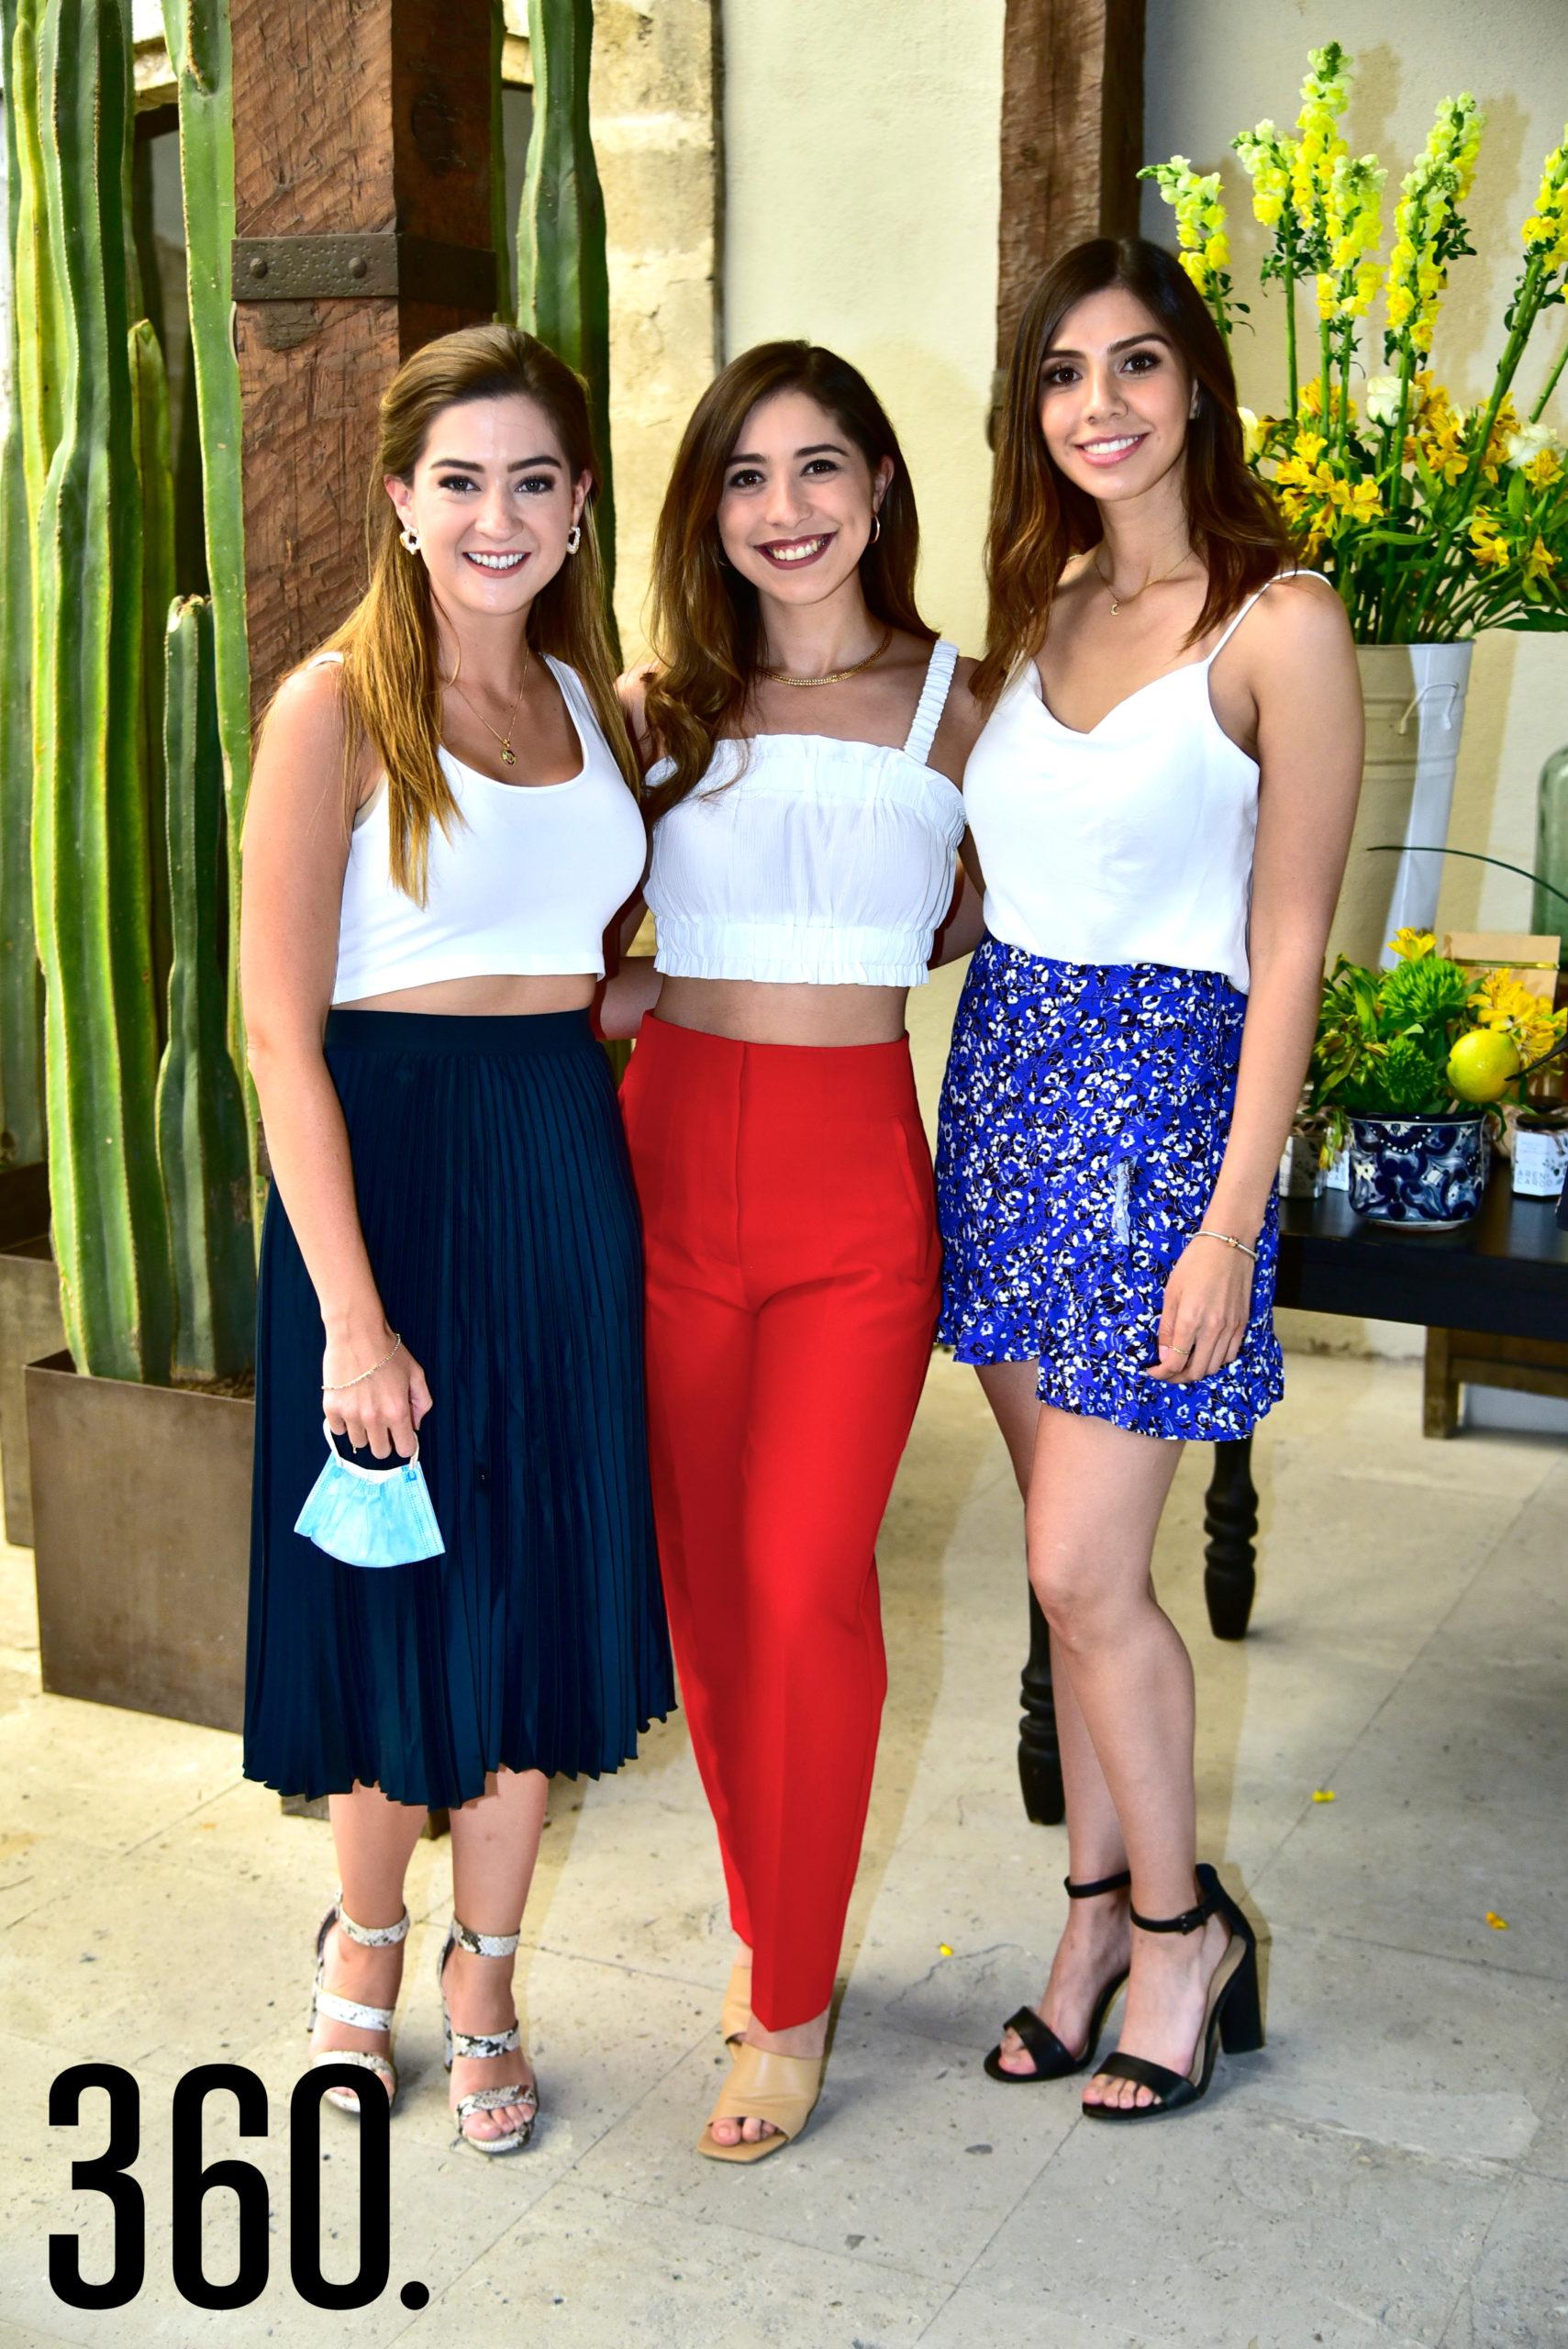 Paulina Arsuaga, Dulce Treviño y Pamela Reyna.